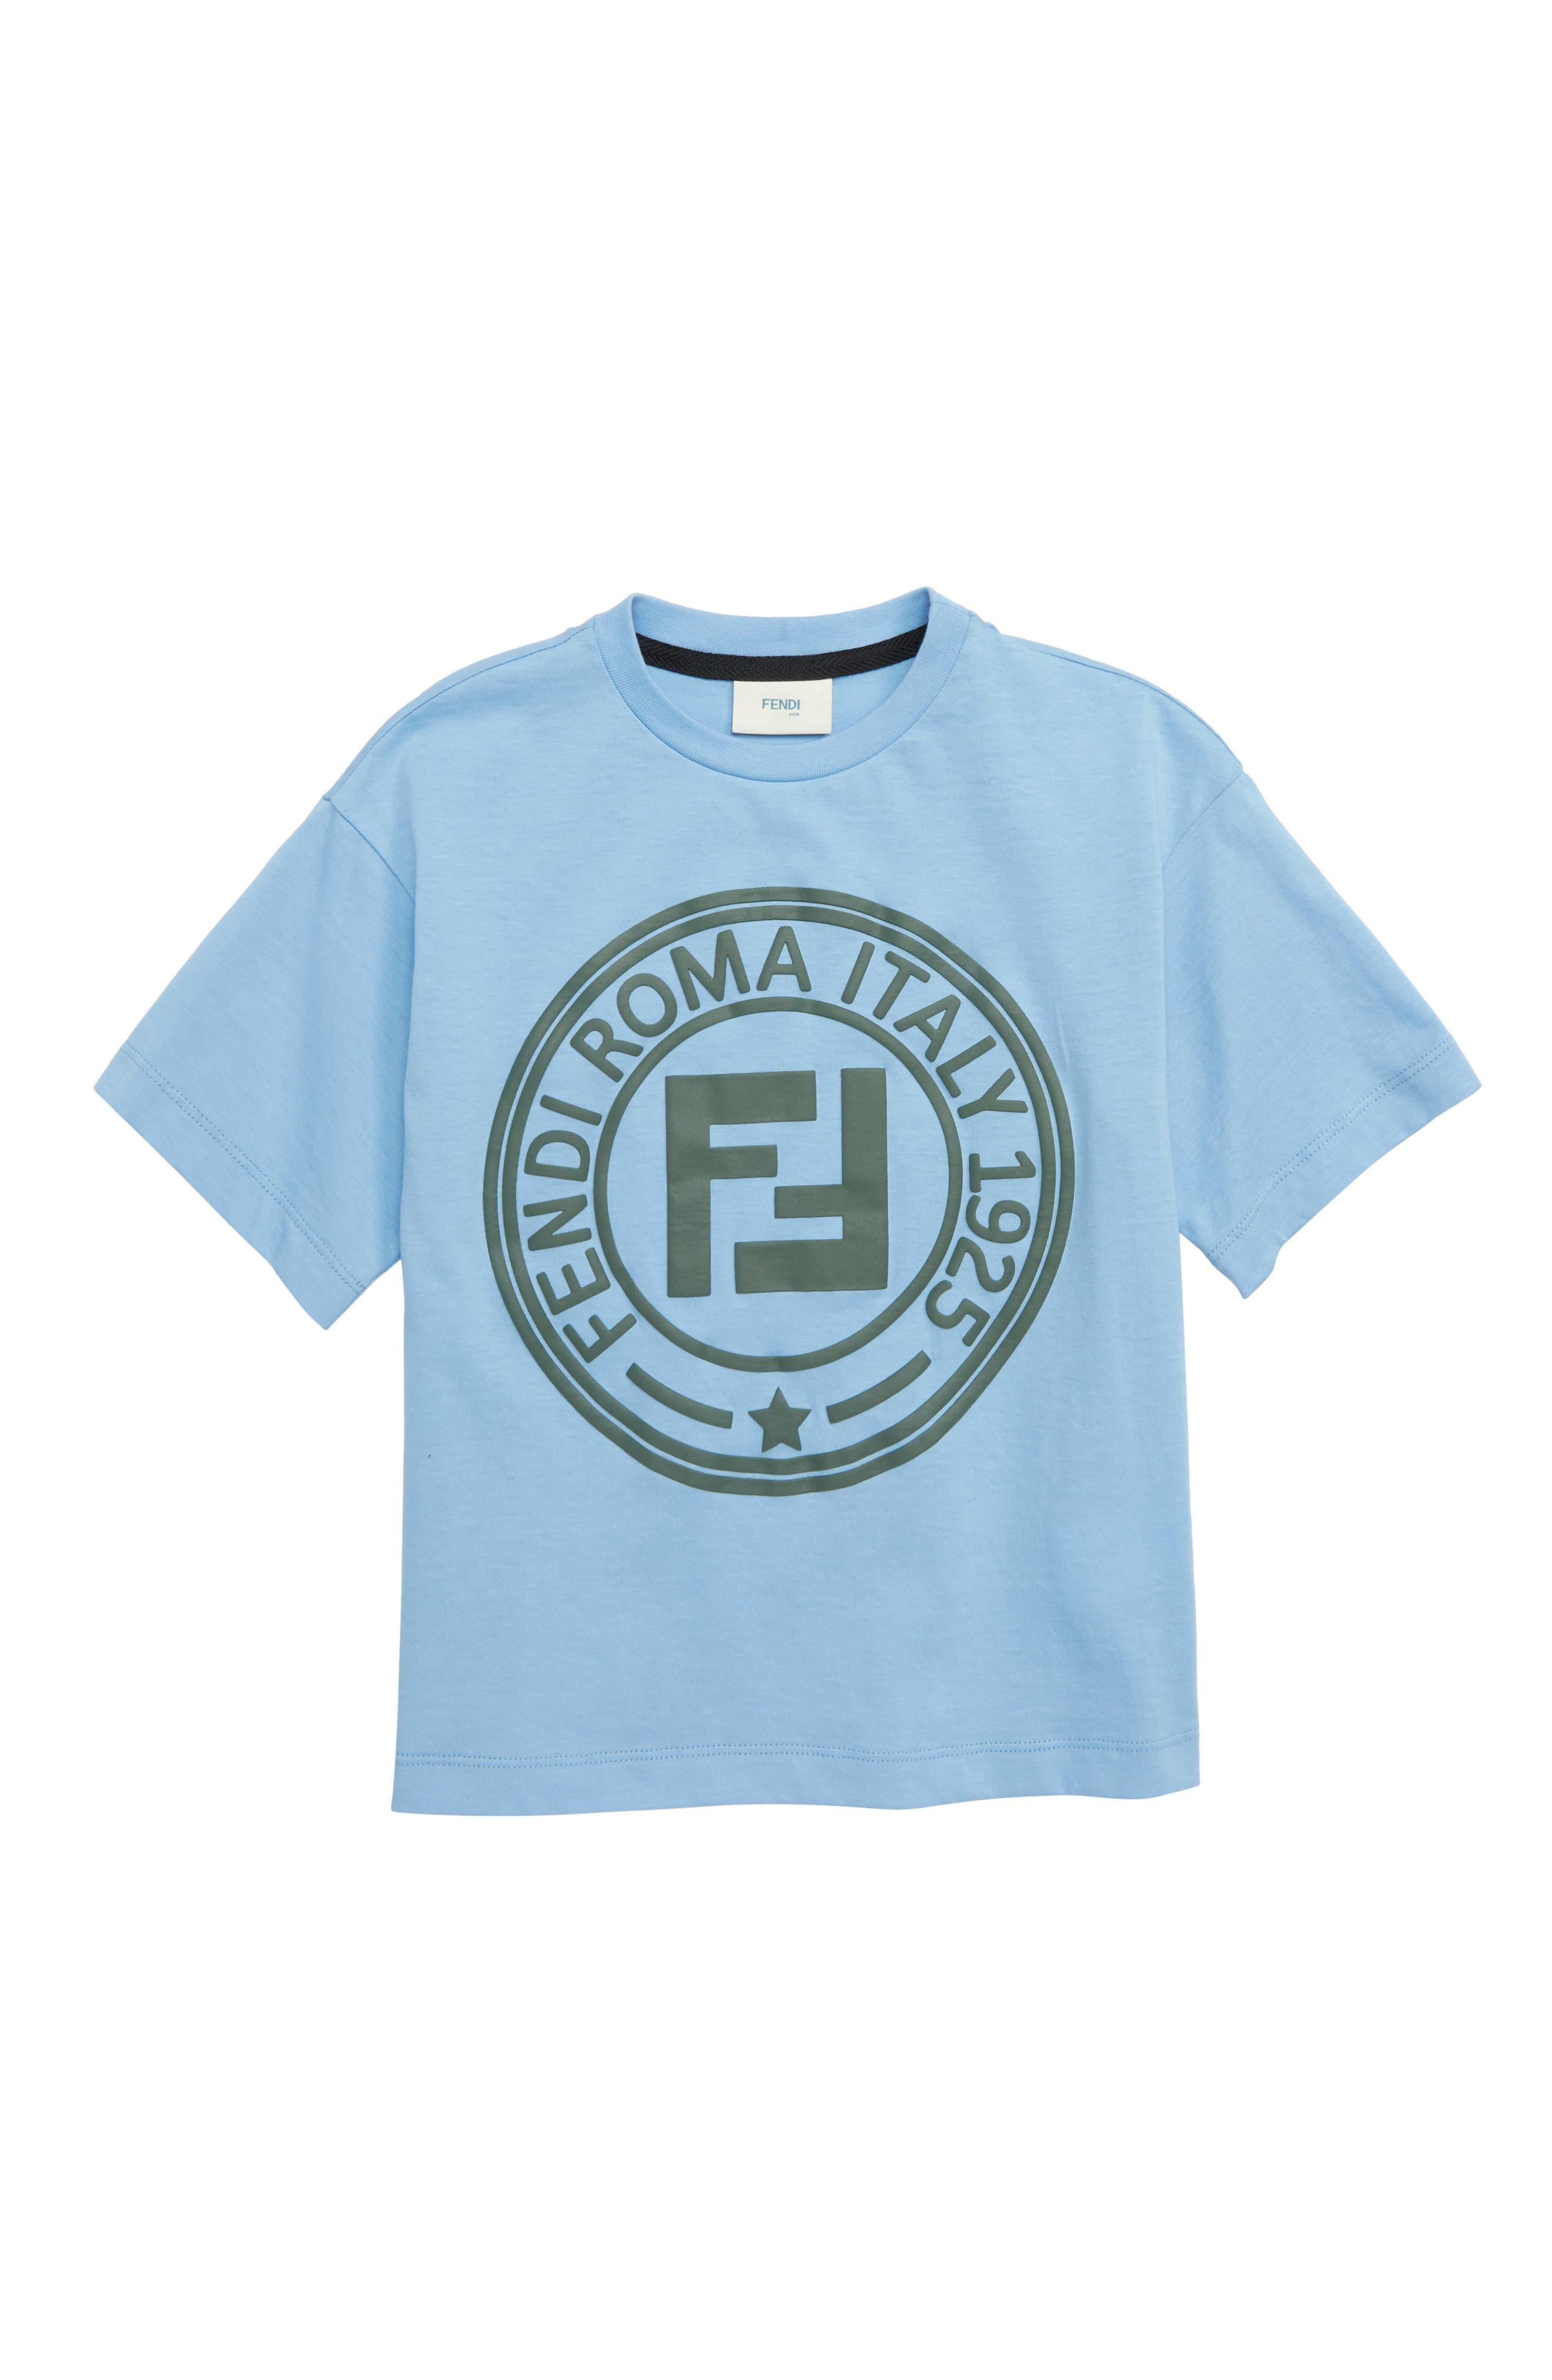 Logo T-Shirt,                             Main thumbnail 1, color,                             F15A3 BLUE